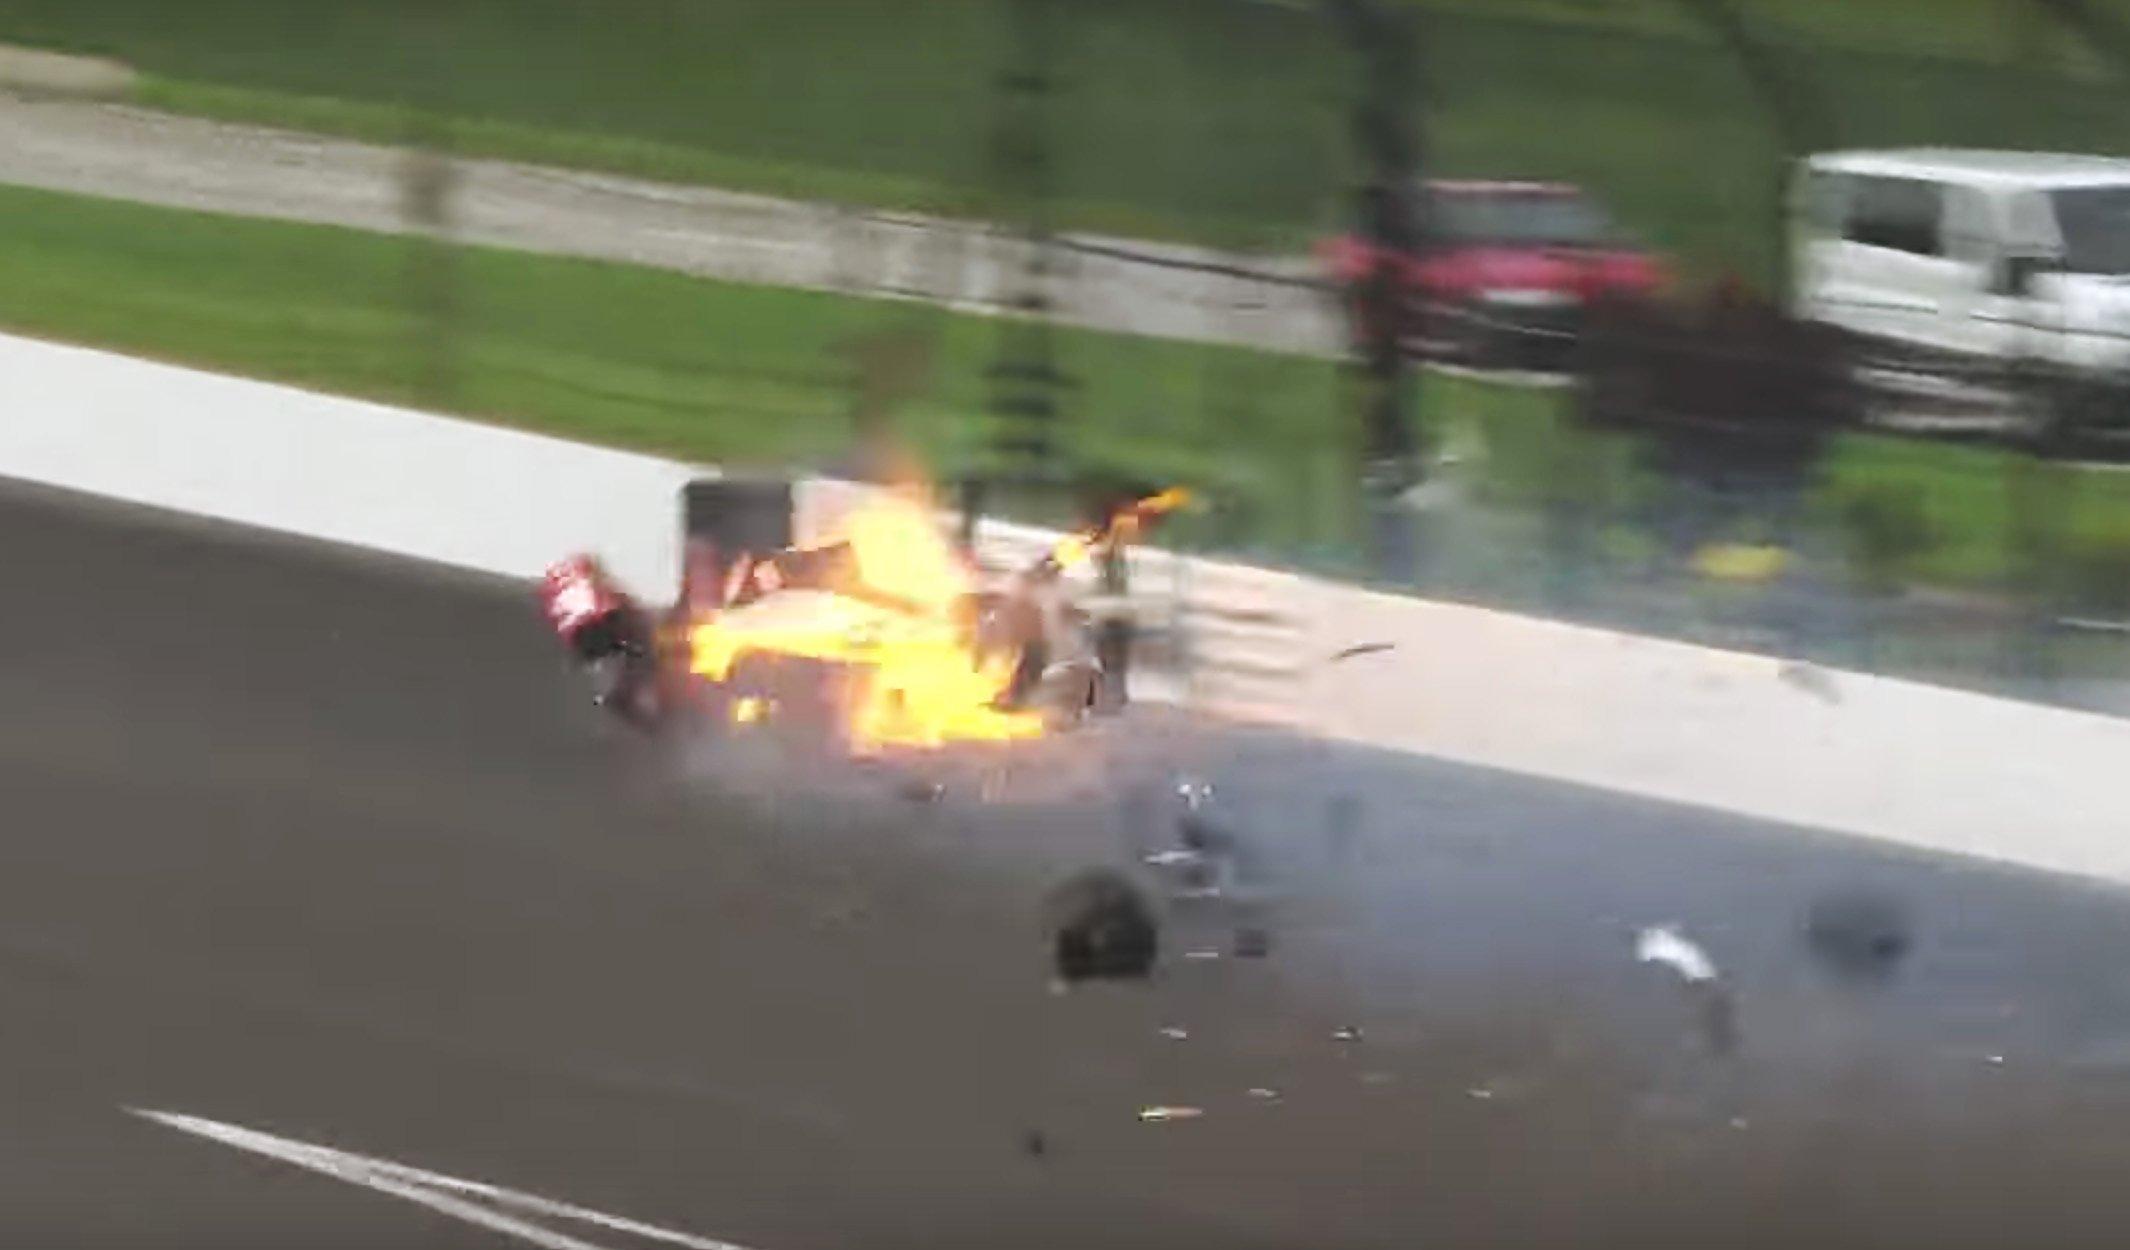 Sebastien Bourdais 2017 Indy 500 crash - Cleared